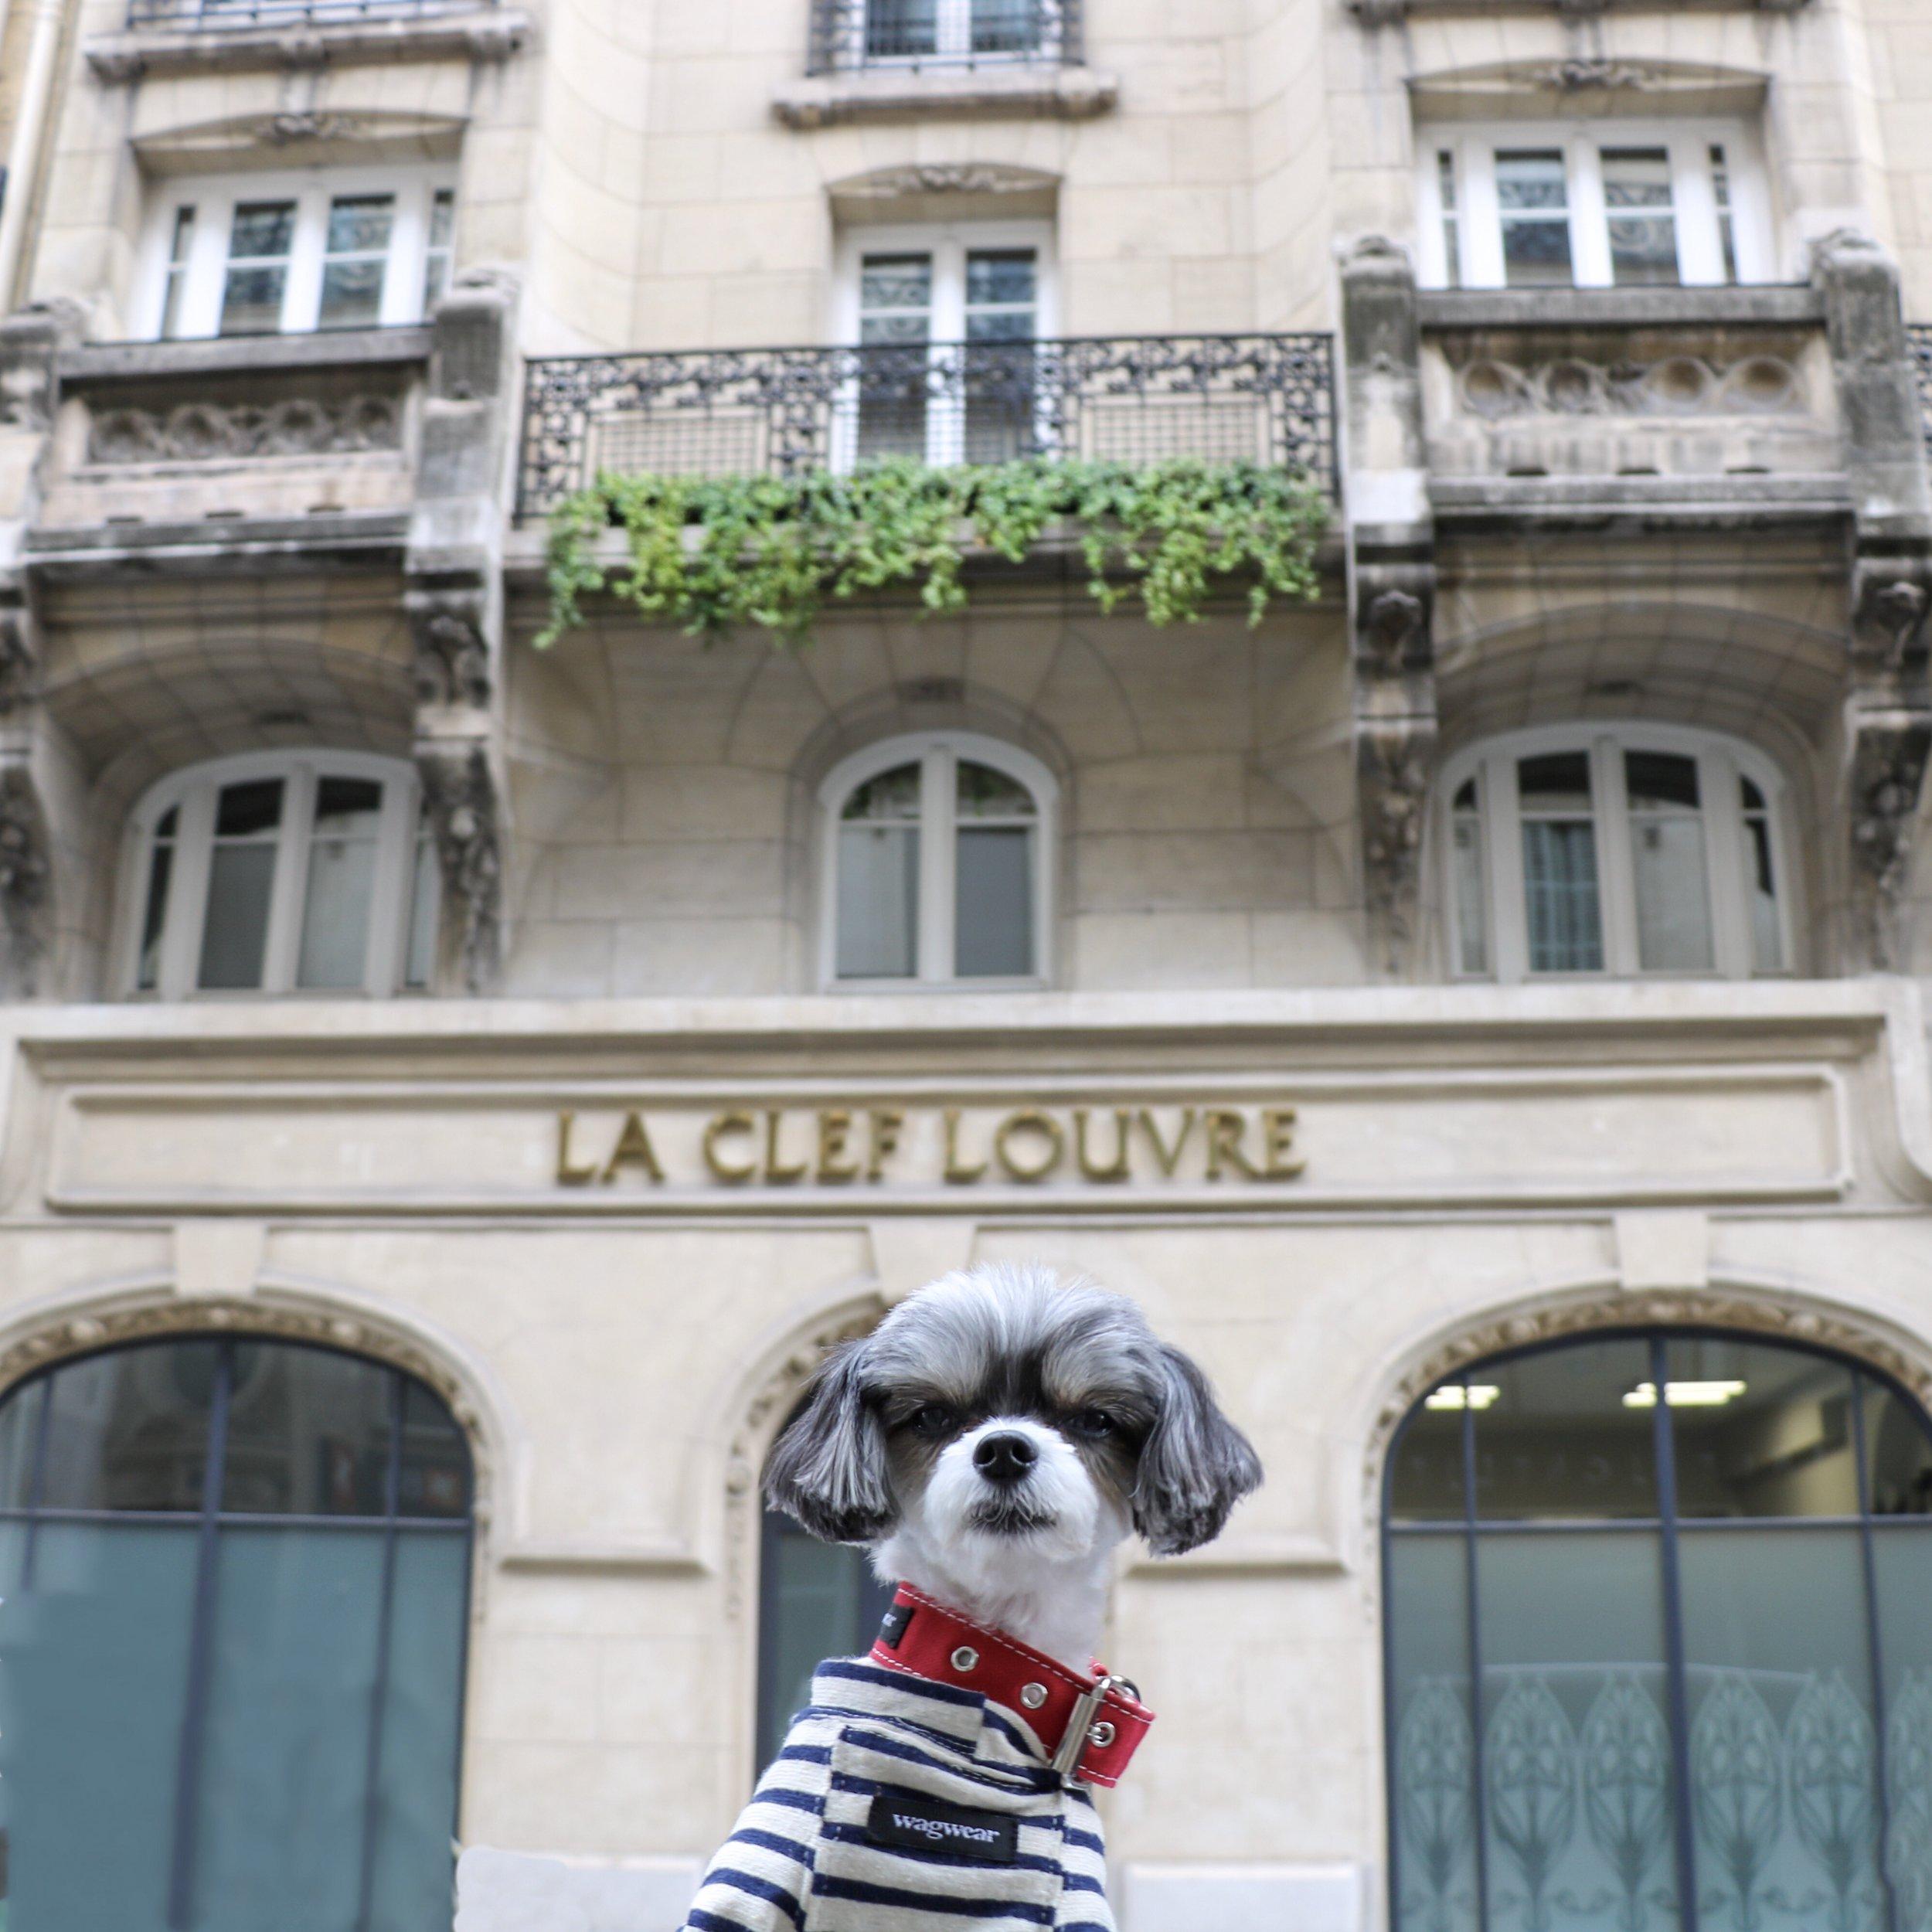 Tinkerbelle outside the La Clef Louvre Paris Hotel